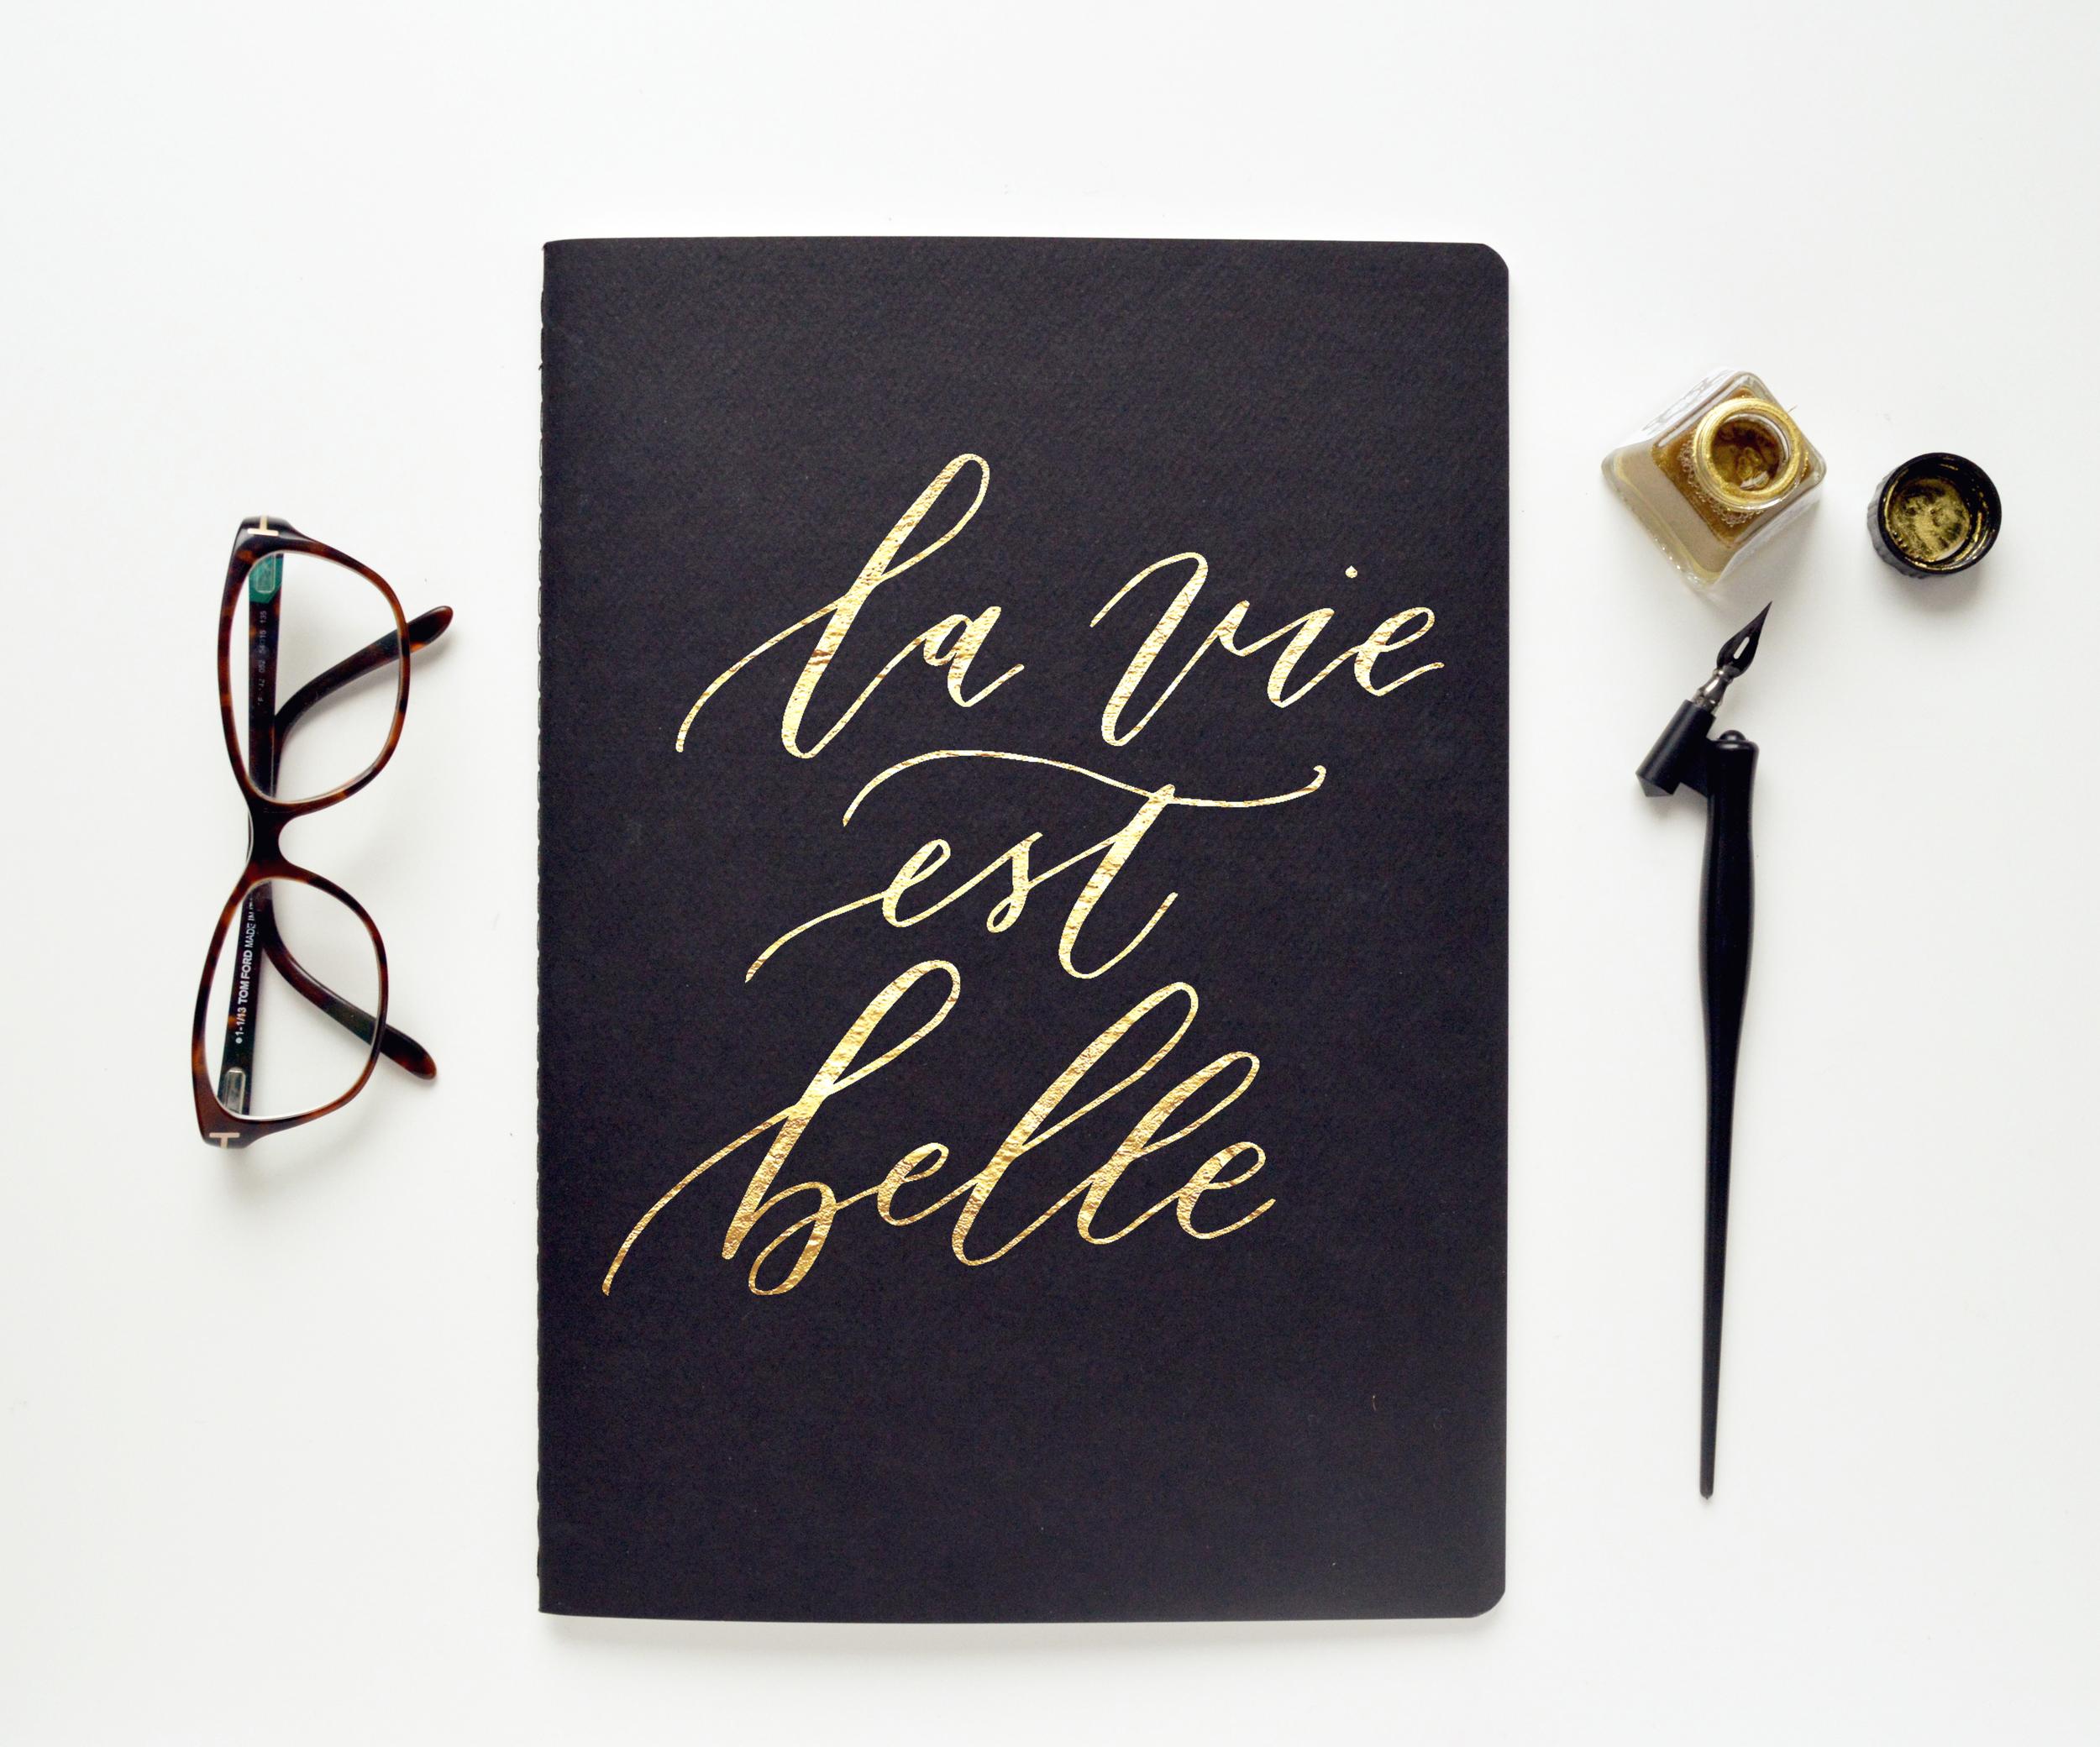 016_La_Vie-Est_Belle.jpg